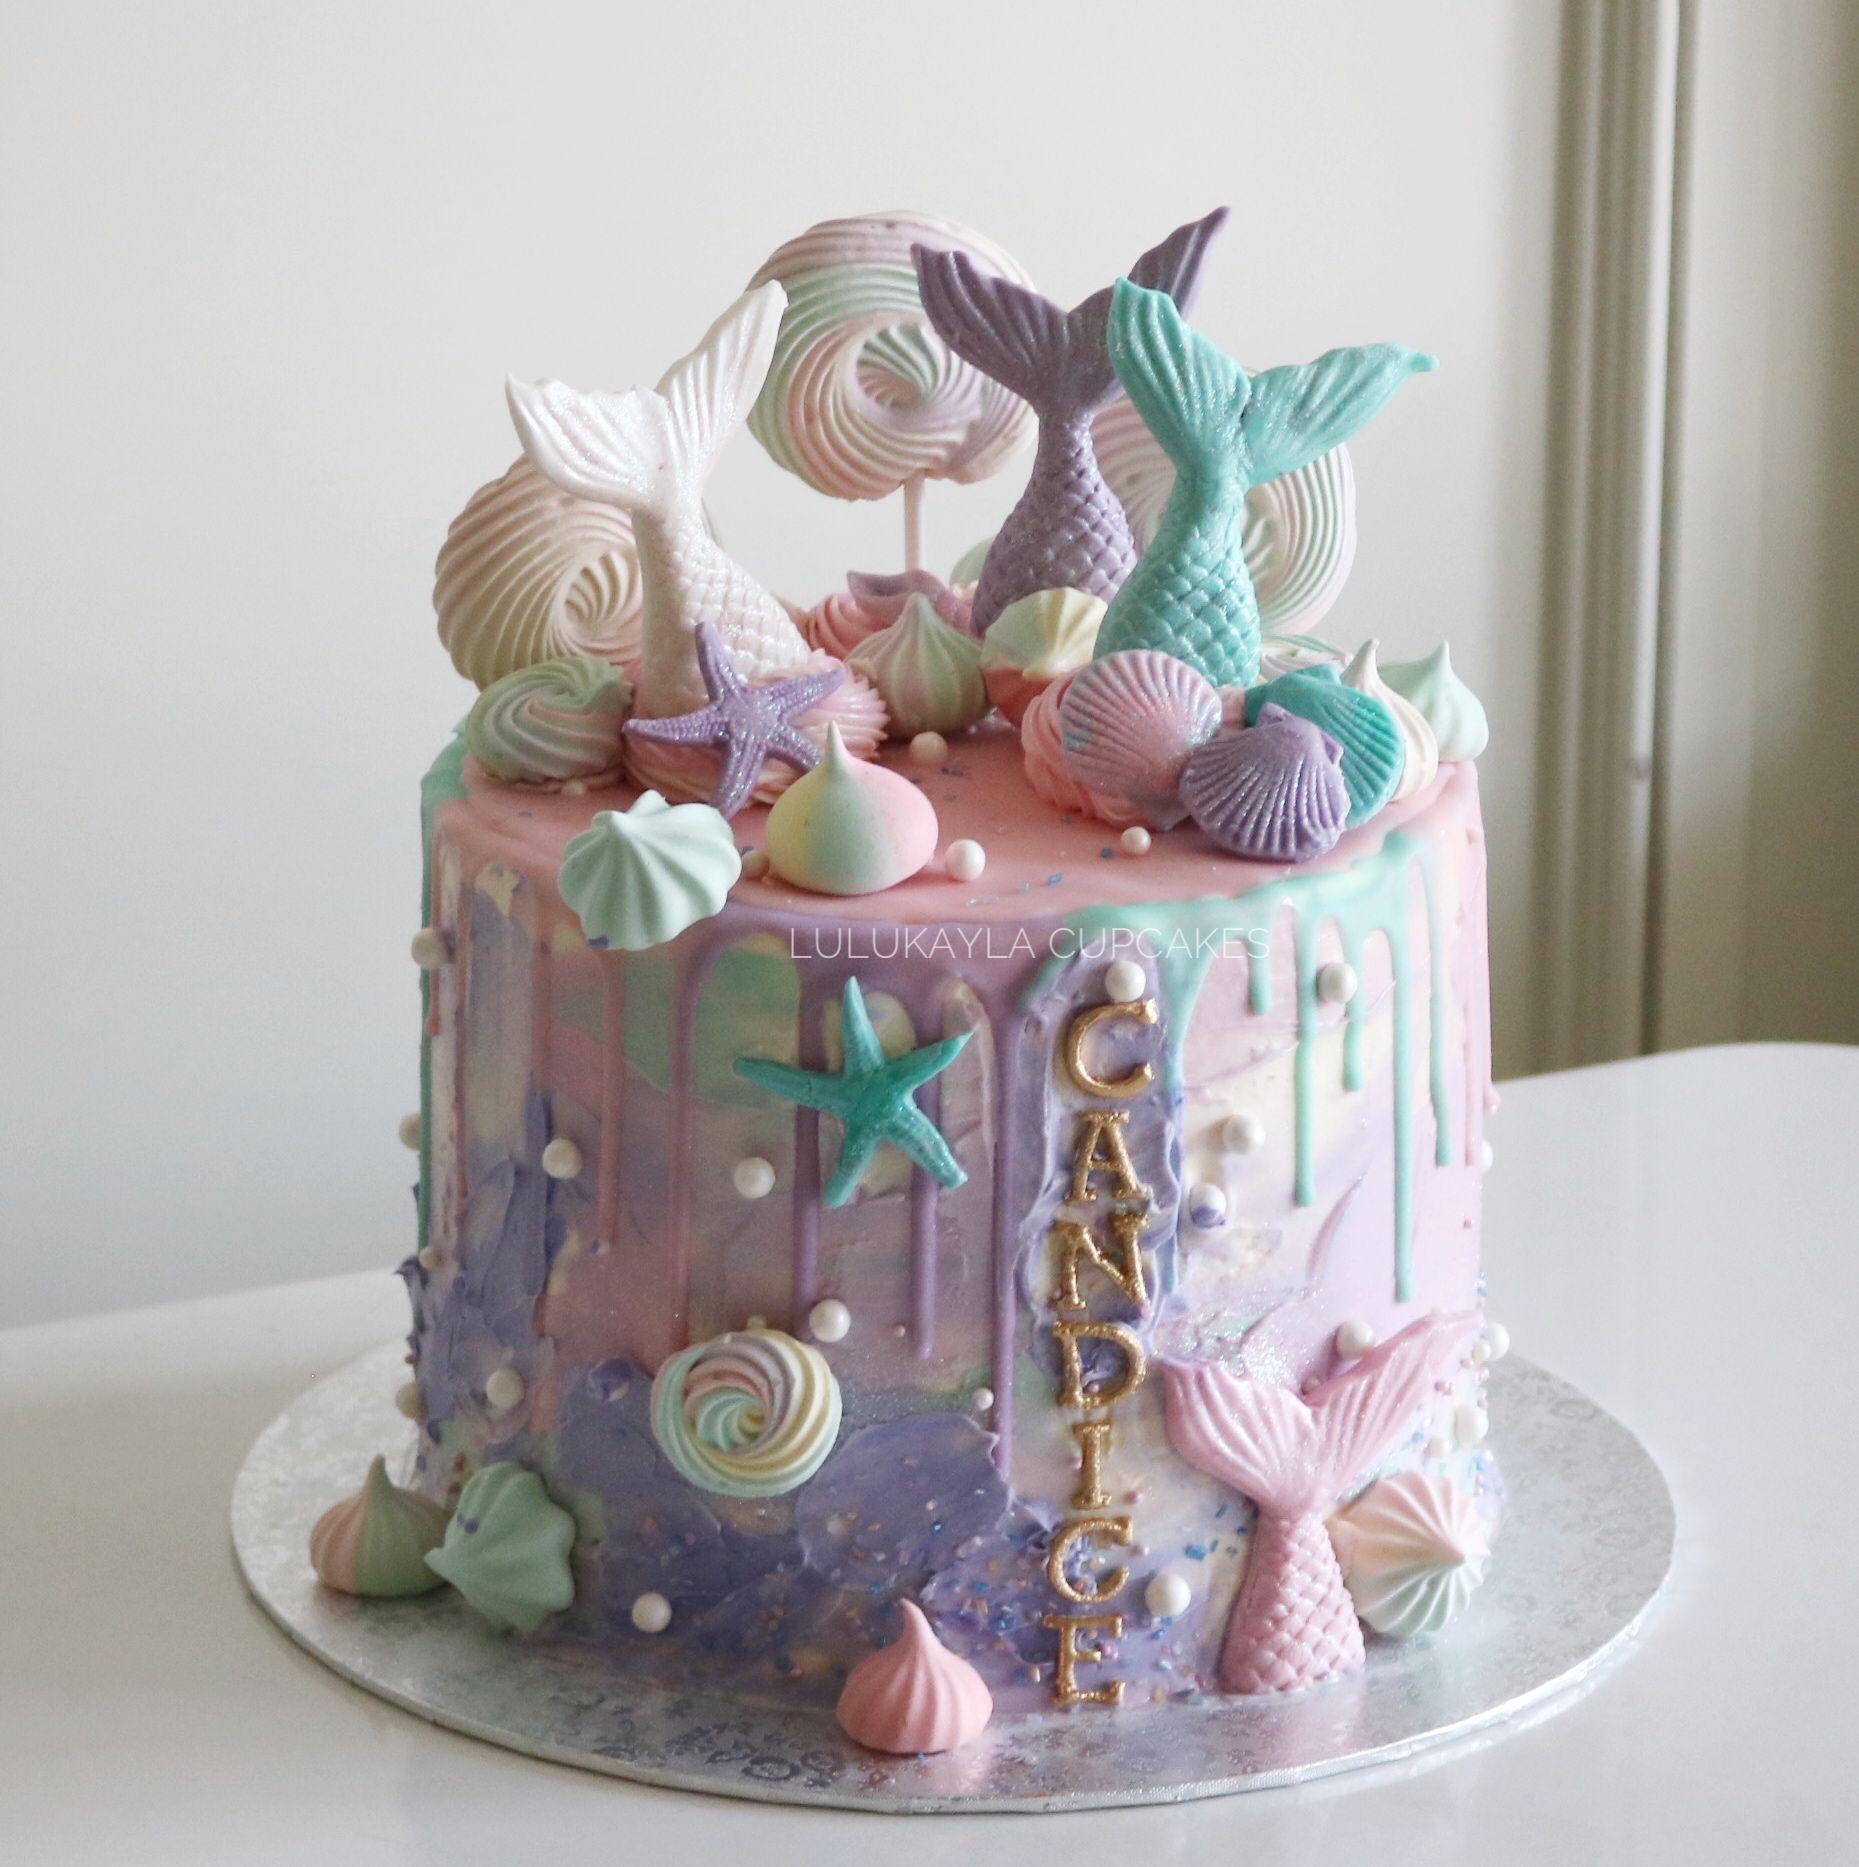 Mermaid Dripping Cake Mermaid Birthday Cakes Drip Cakes